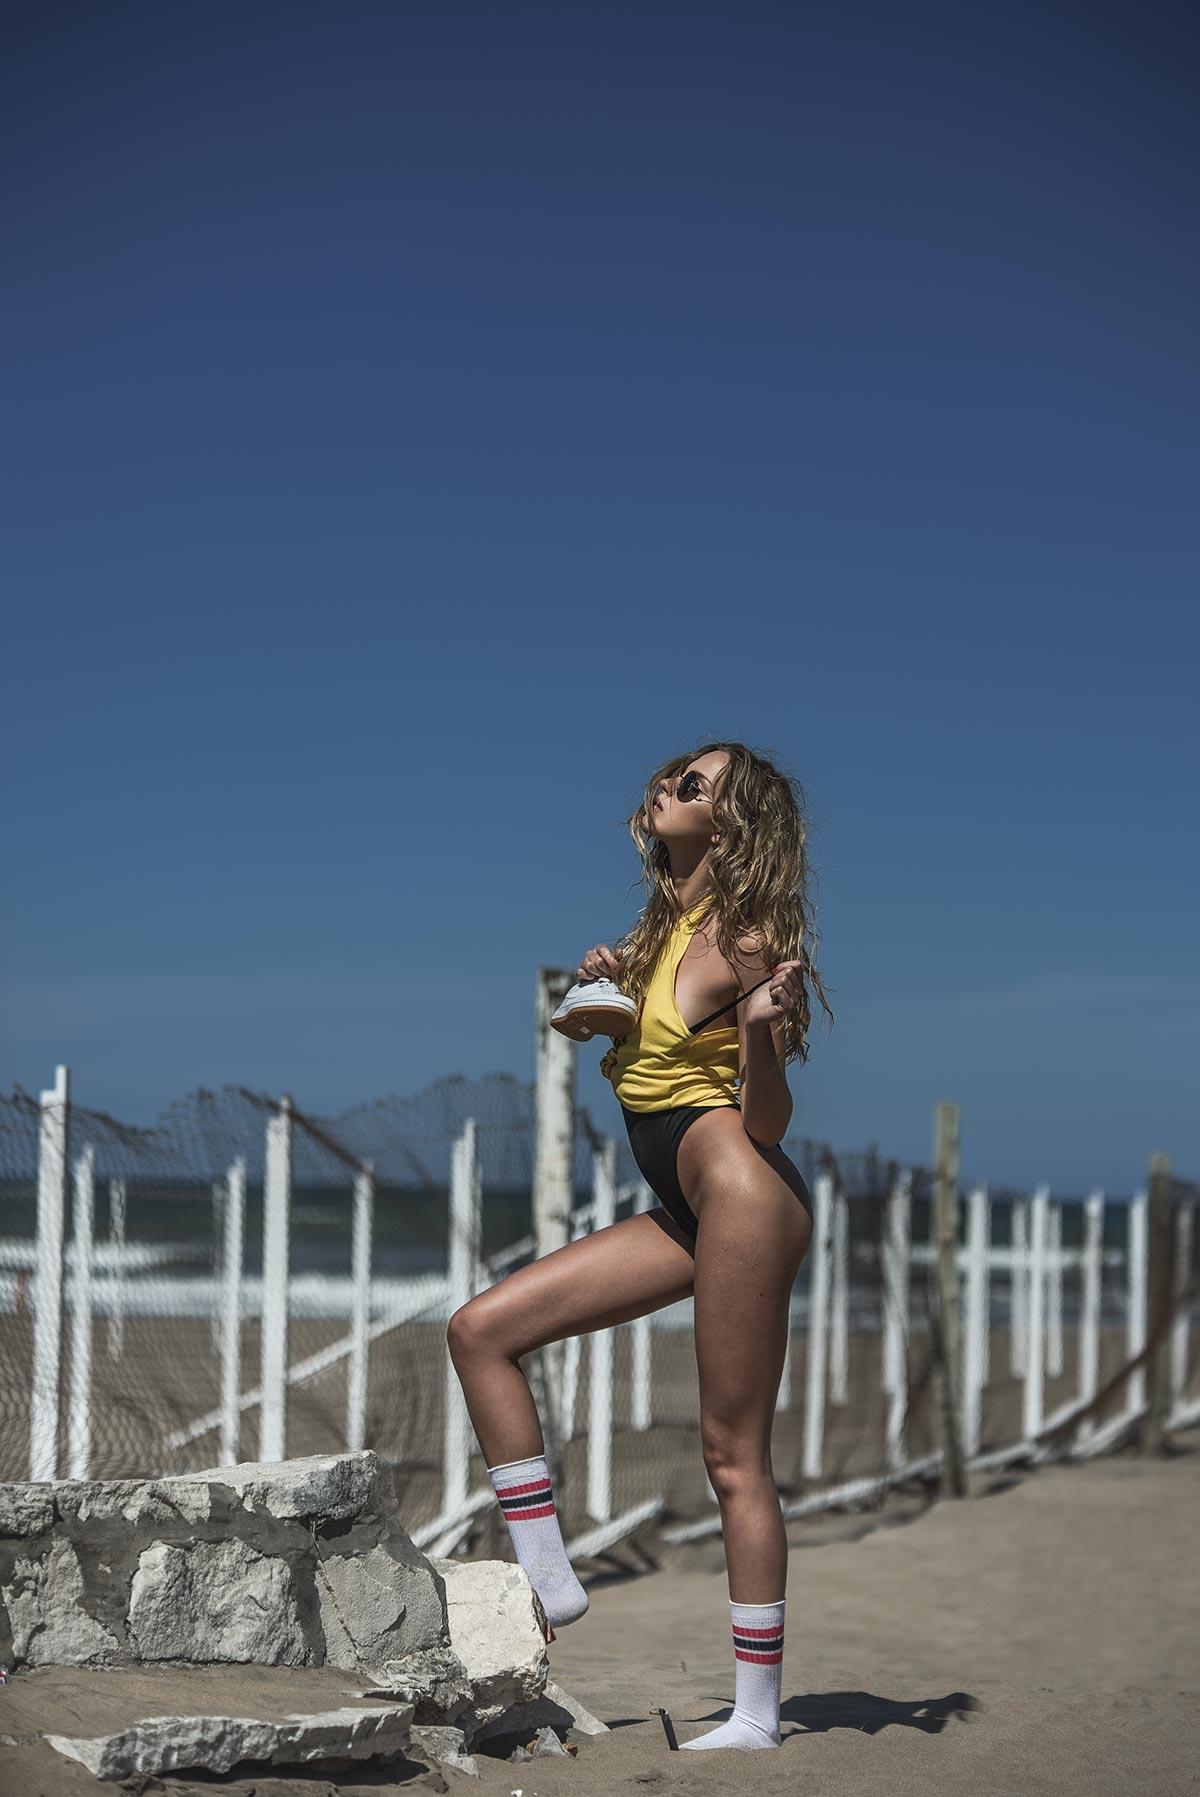 Strandatmosphäre mit Kryss Wood und Alejandro Bauducco 5